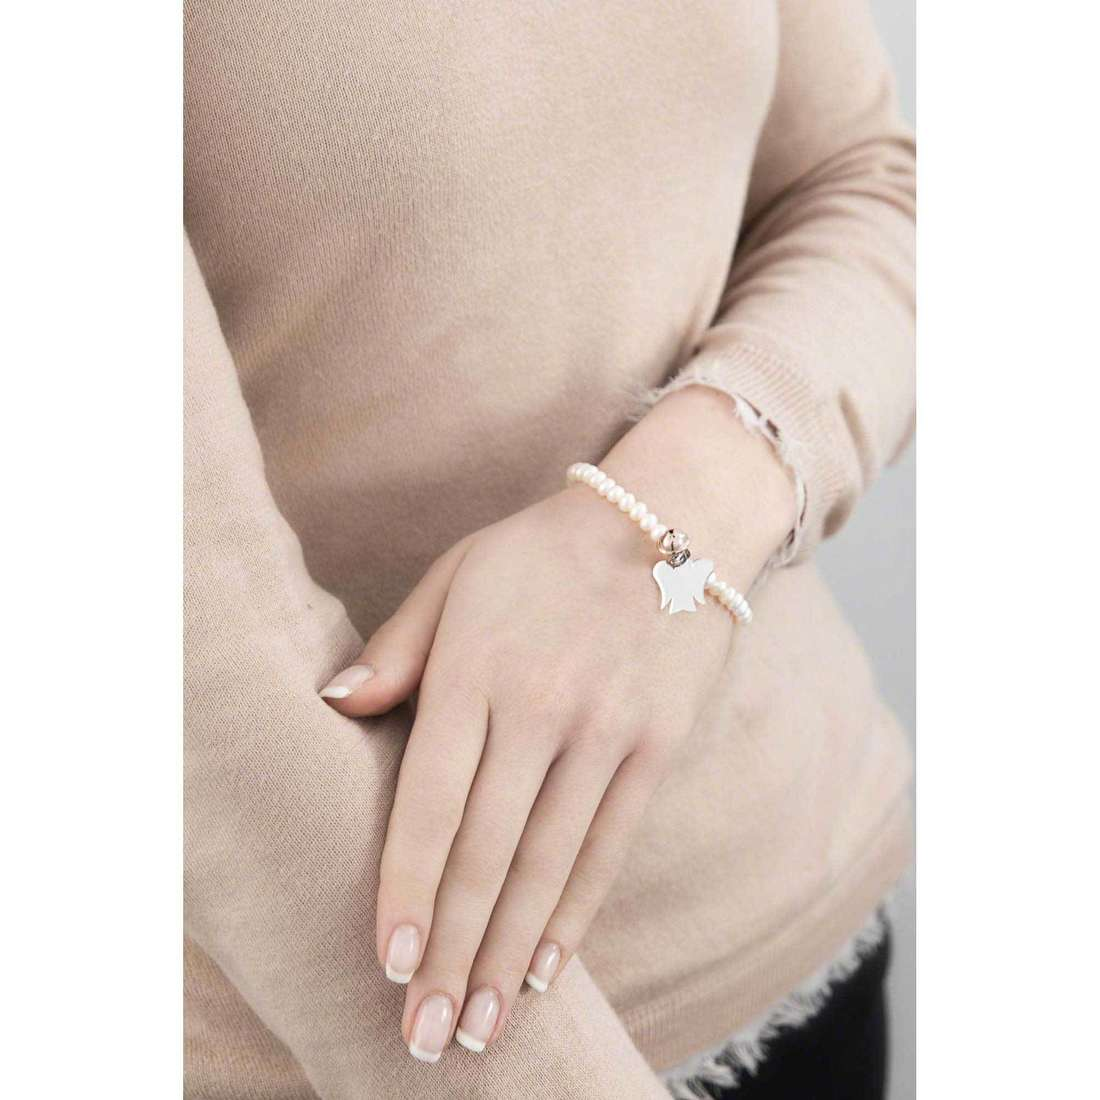 Giannotti bracelets Chiama Angeli femme GIA253 indosso